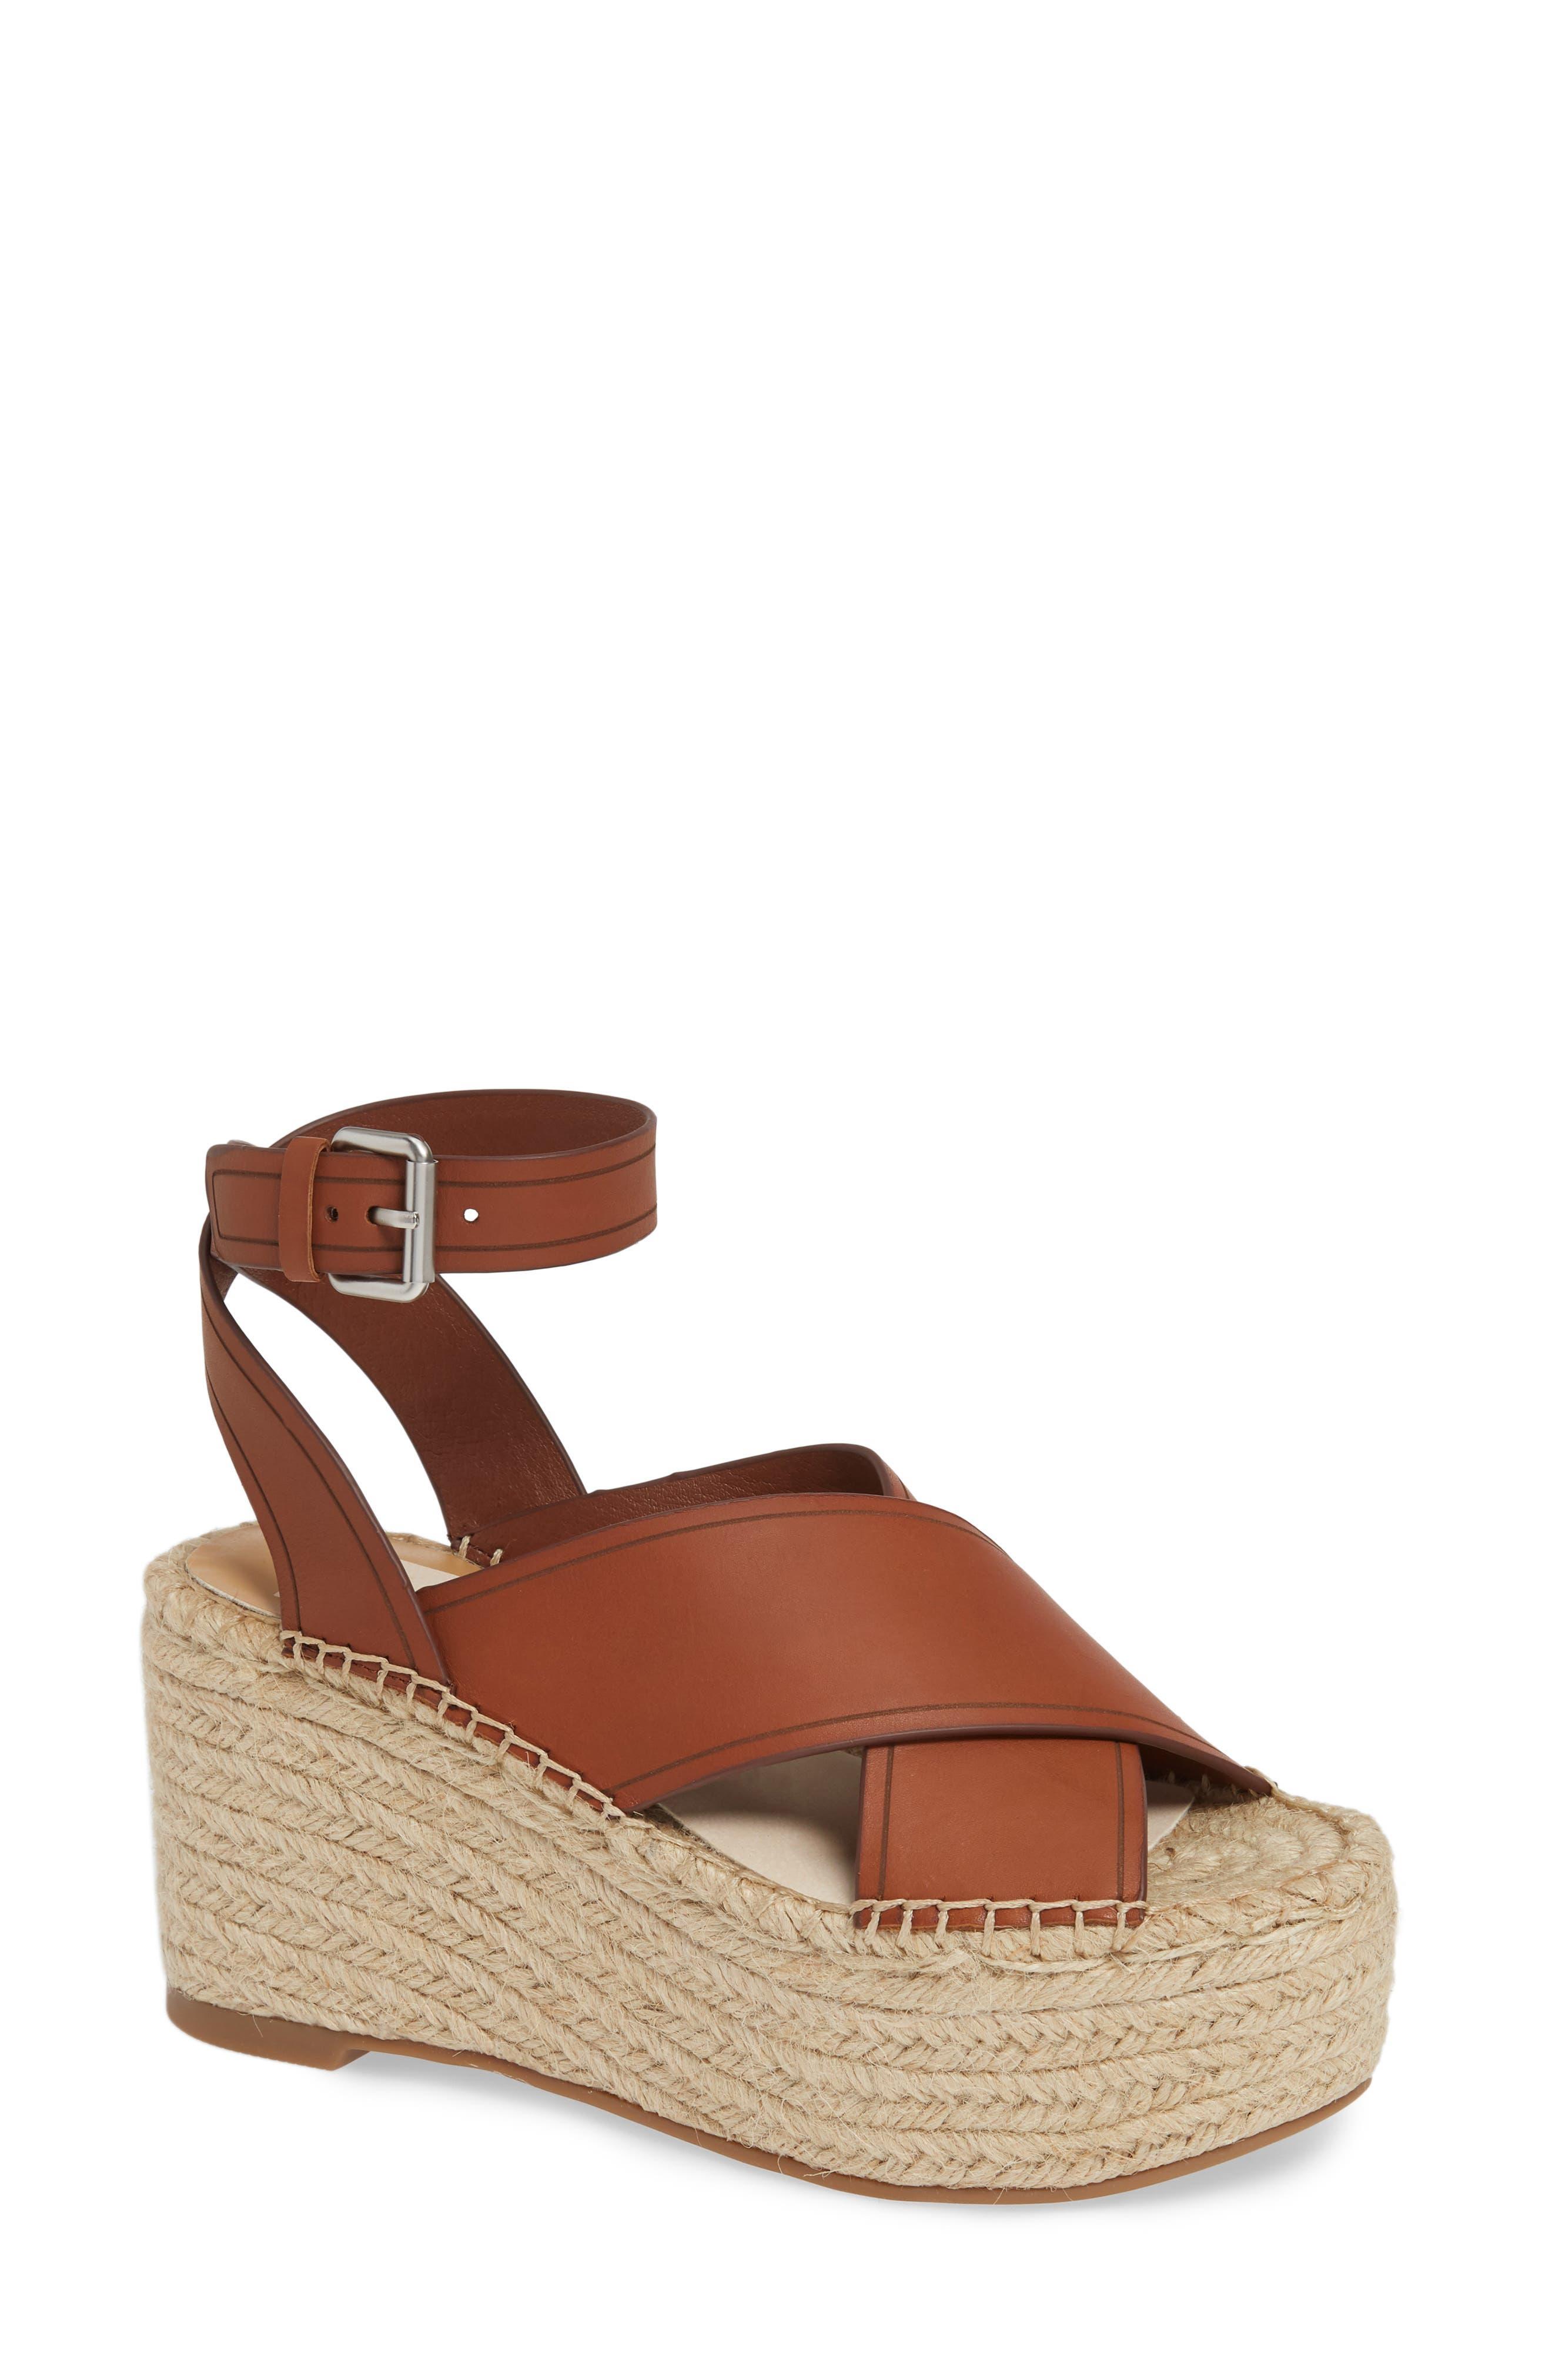 DOLCE VITA, Carsie Platform Sandal, Main thumbnail 1, color, BROWN LEATHER